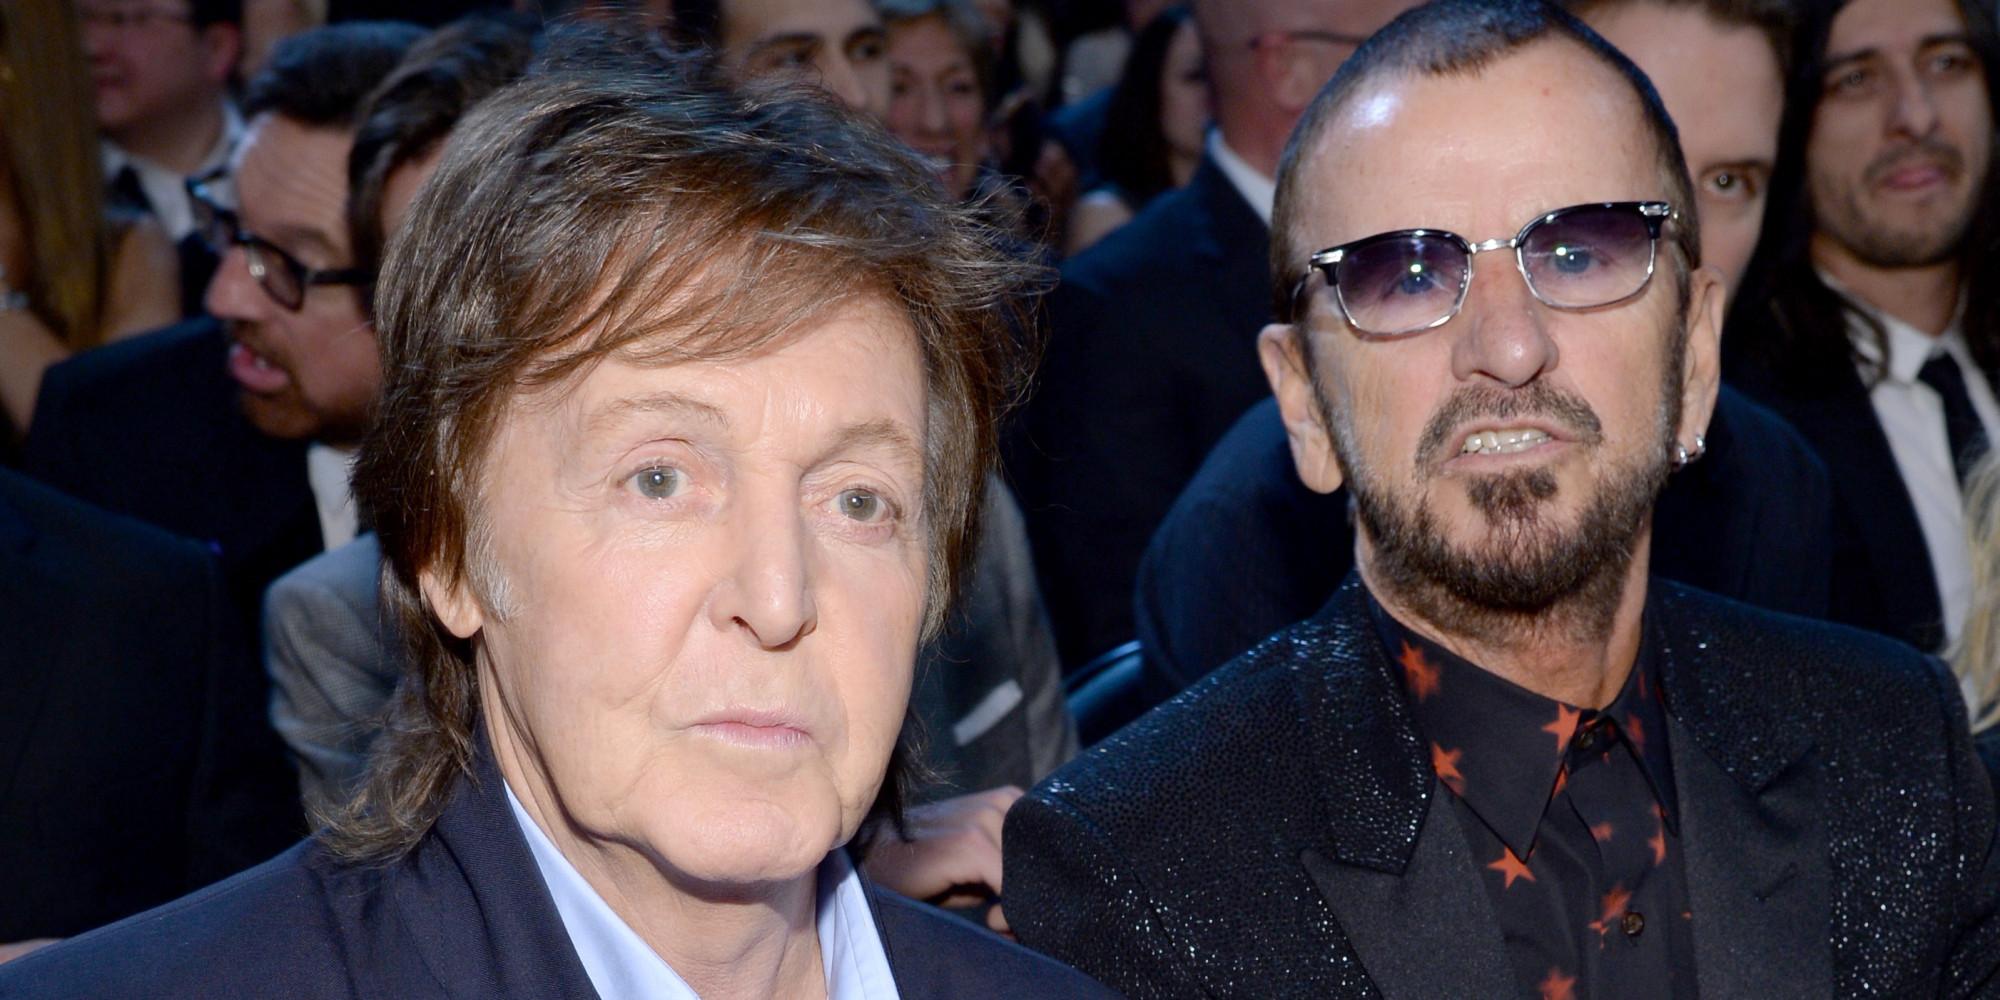 Paul McCartney Ringo Starr Grammys Performances Beatles Reunite